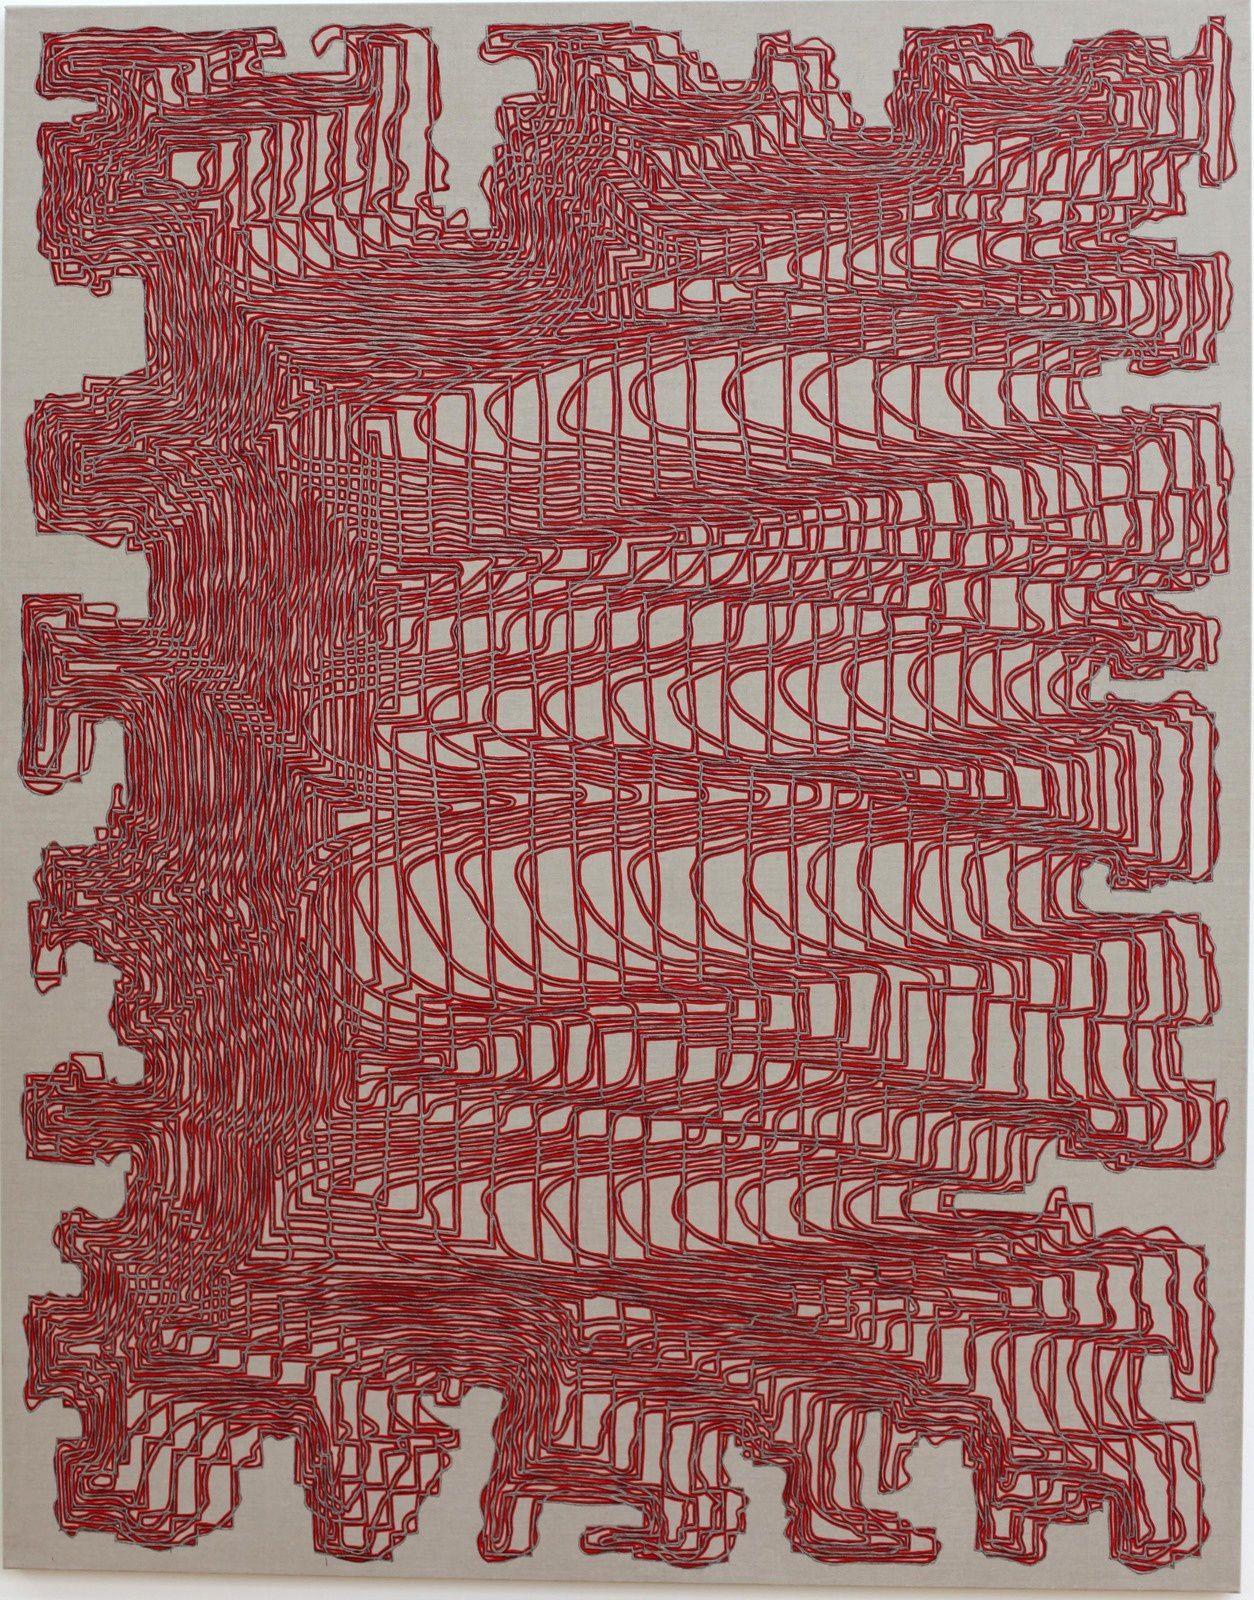 """TYCLOICTRADN"", 2019 de James SIENA - Courtesy de l'Artiste et la Galerie Xippas  Photo Éric Simon"